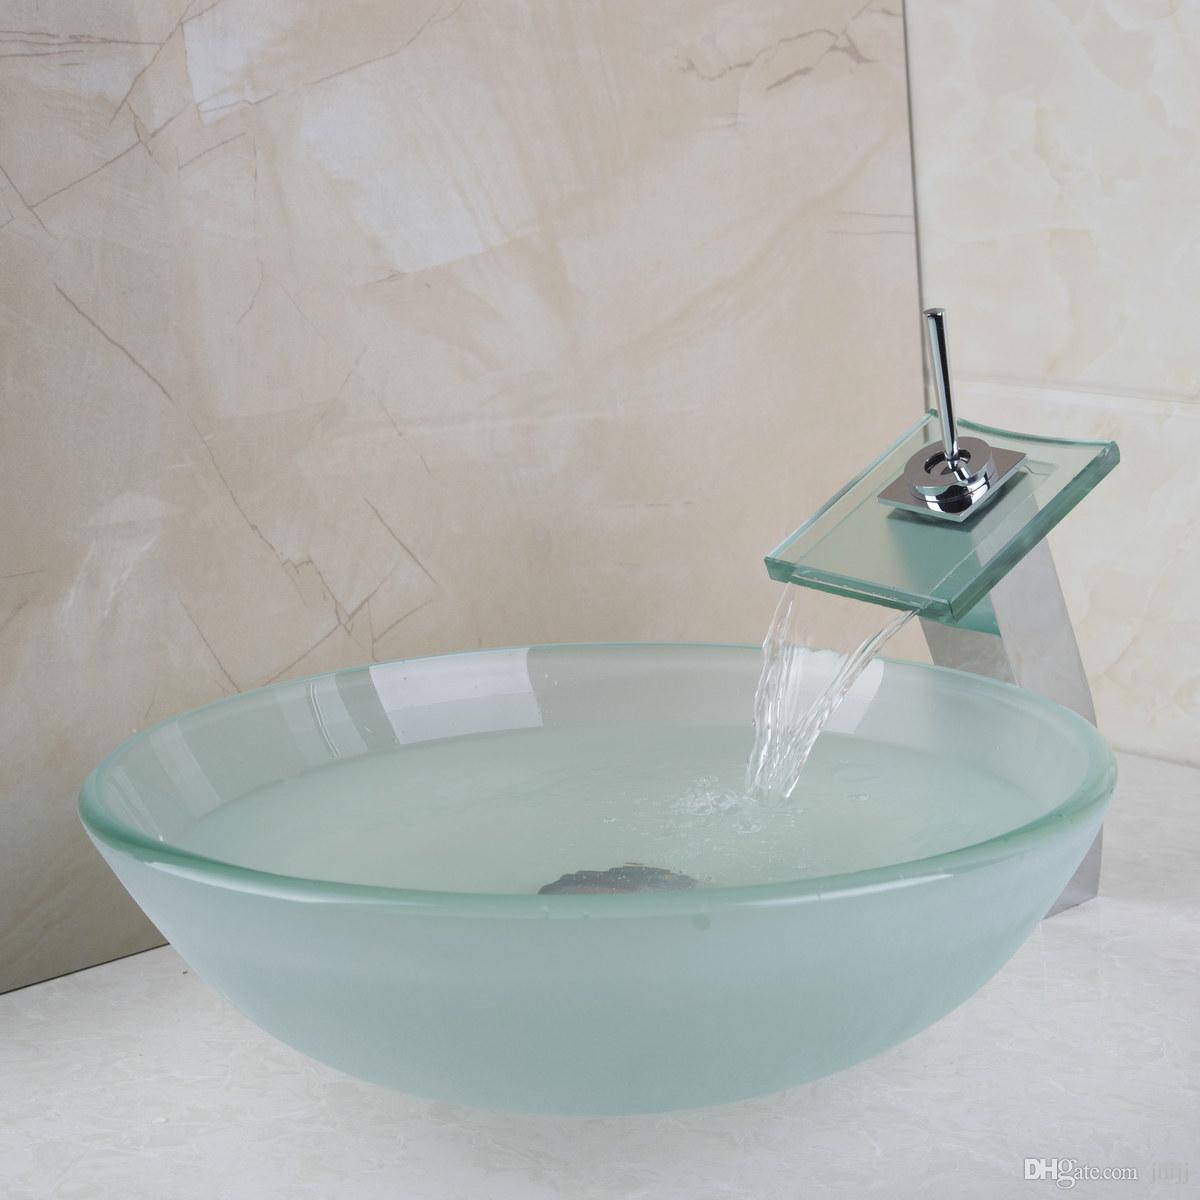 2018 40678221a Bathroom Wahs Basin Set Glass Basin And Faucet Taps ...